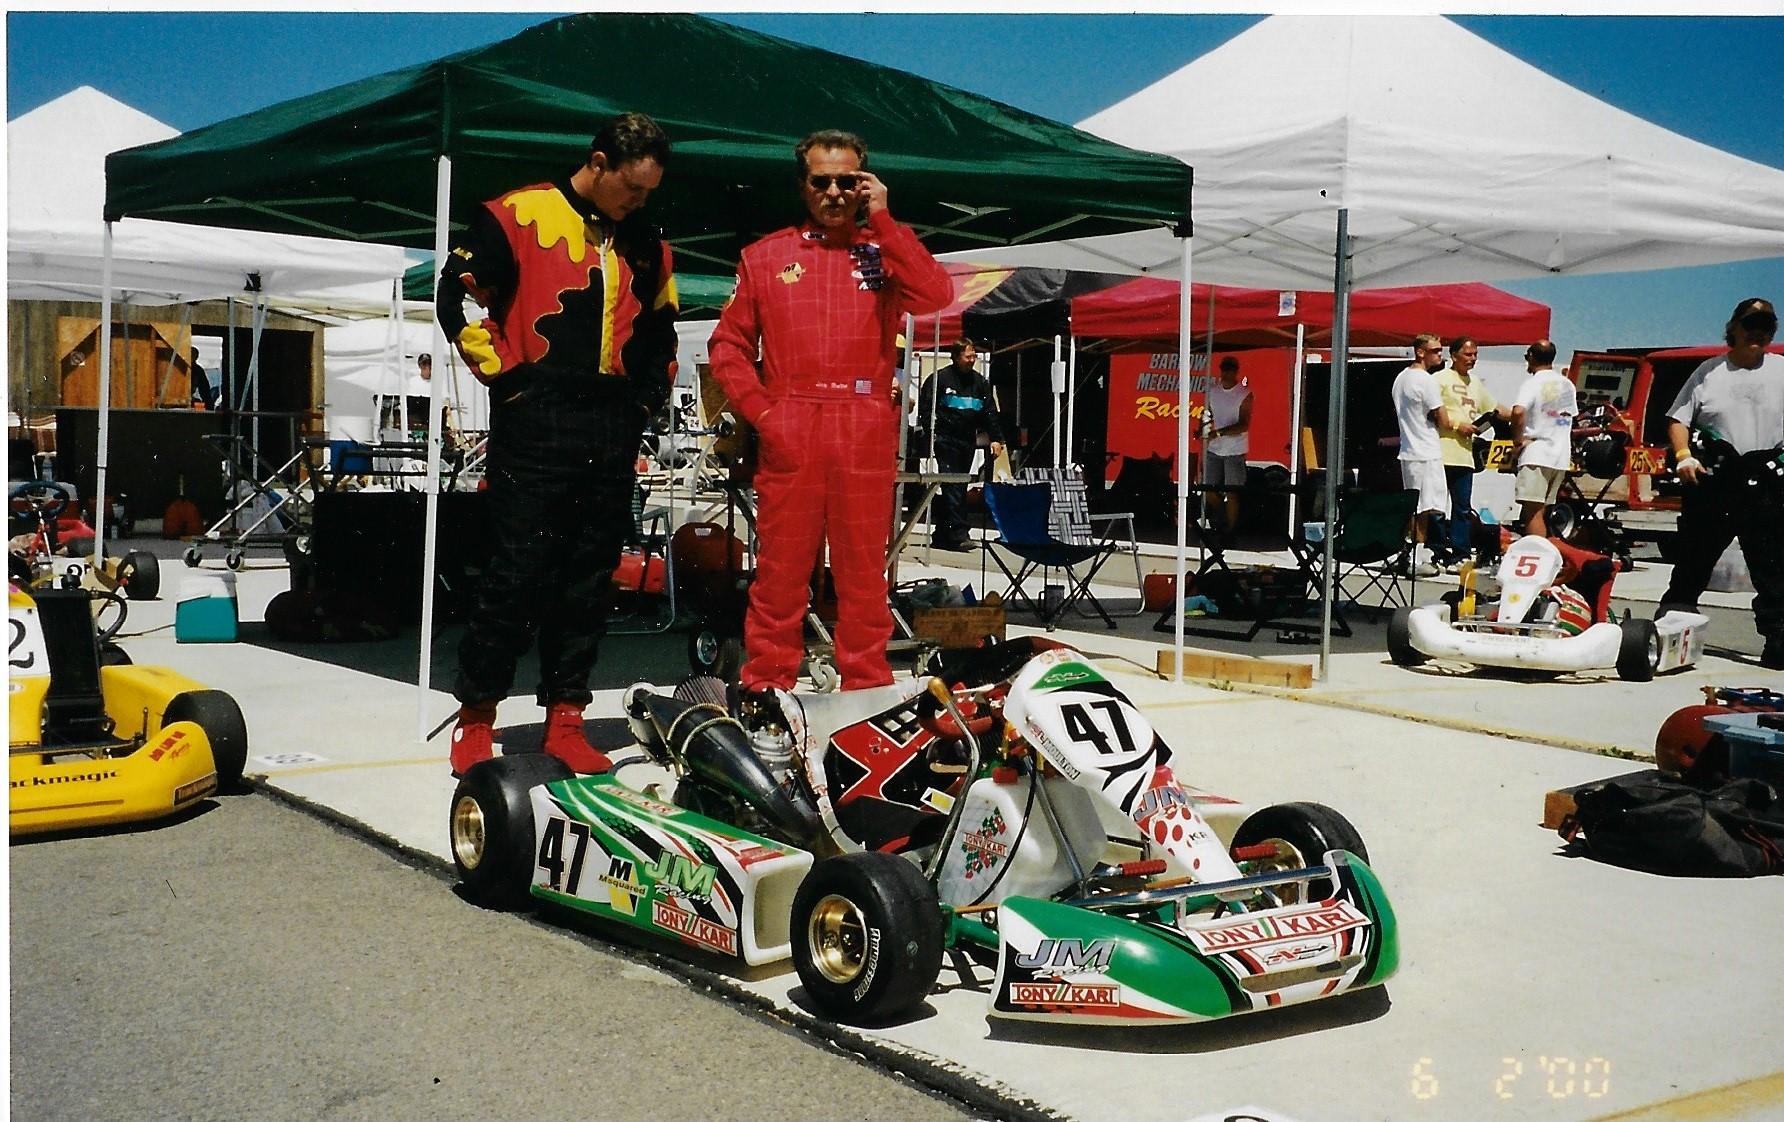 Larry at the Windham – Orem Utah race around 2000-2001.